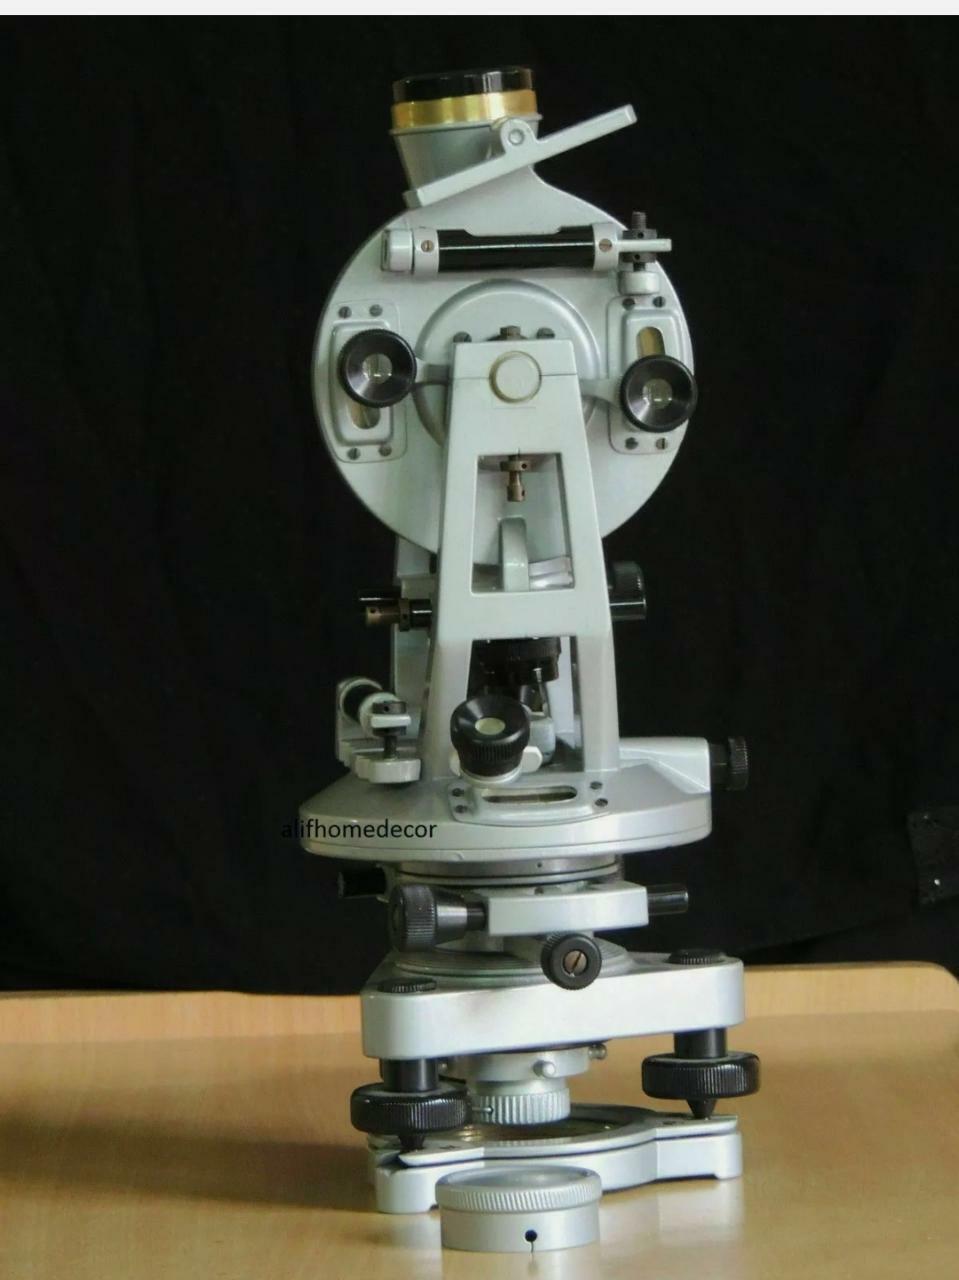 Transit Alidade Surveying Instrument 20 Seconds Brass Theodolite 100% working